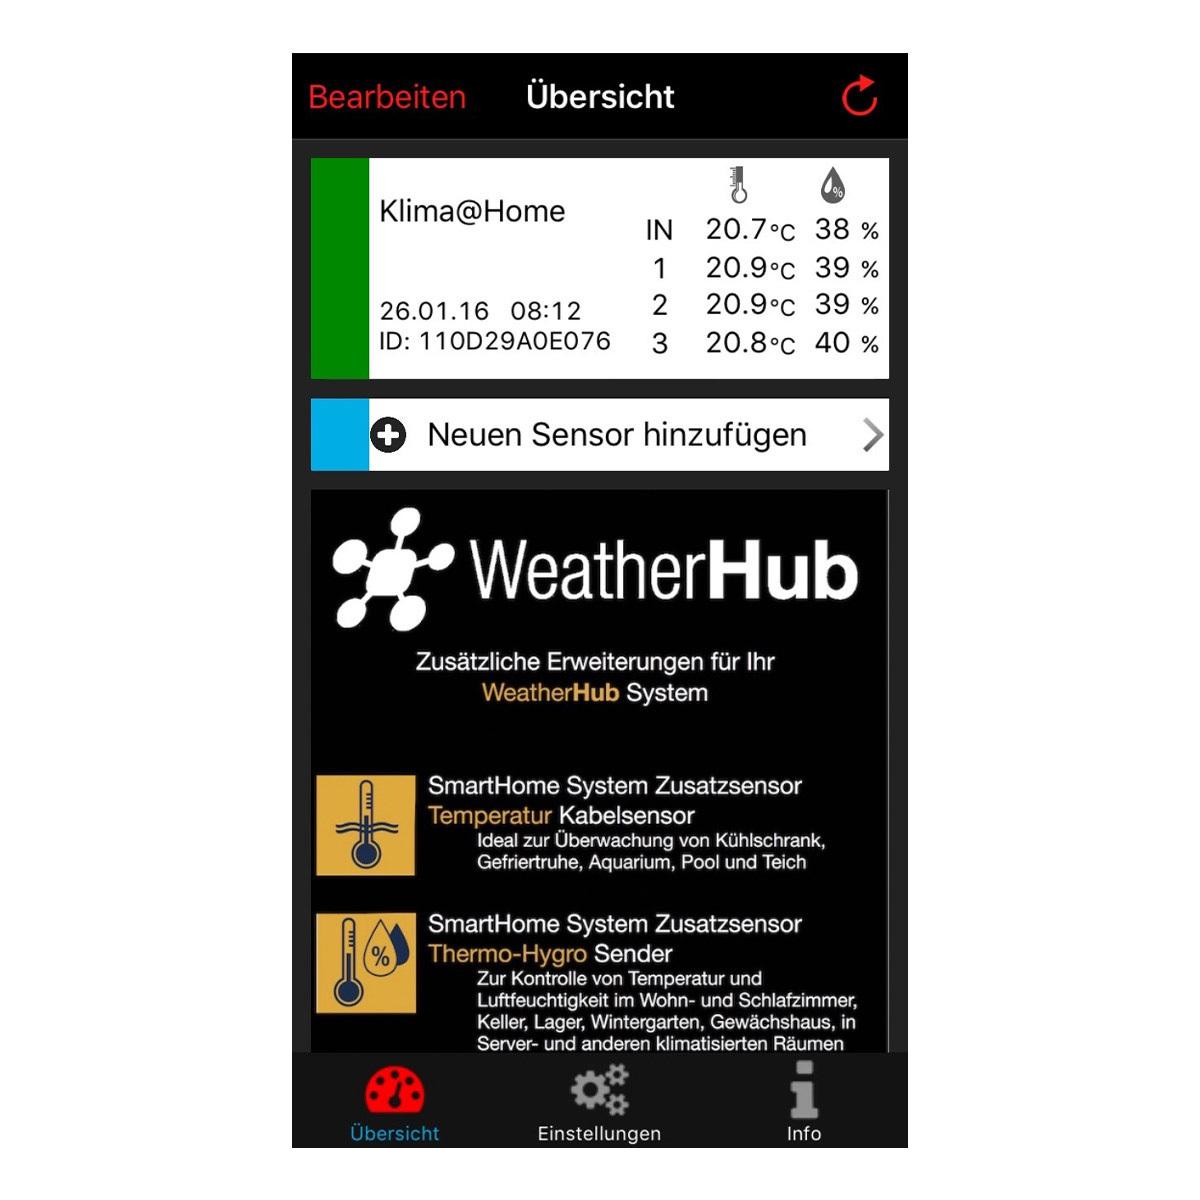 31-4007-02-starter-set-mit-klima@home-funk-thermo-hygrometer-weatherhub-app-anwendung-1200x1200px.jpg